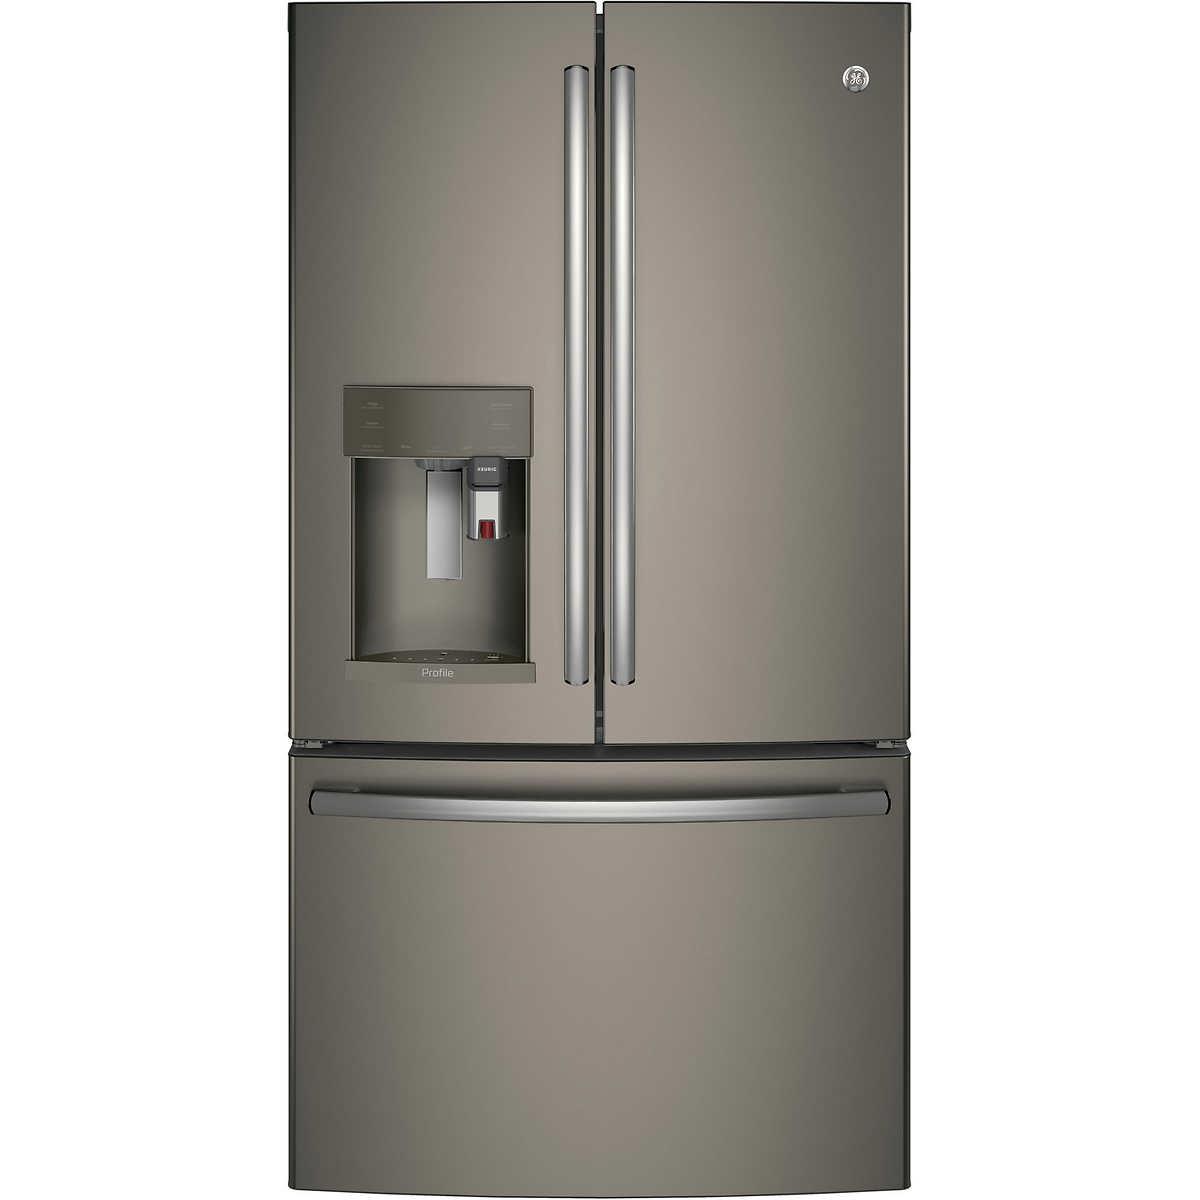 Ge Service Phone Number Refrigerators Costco